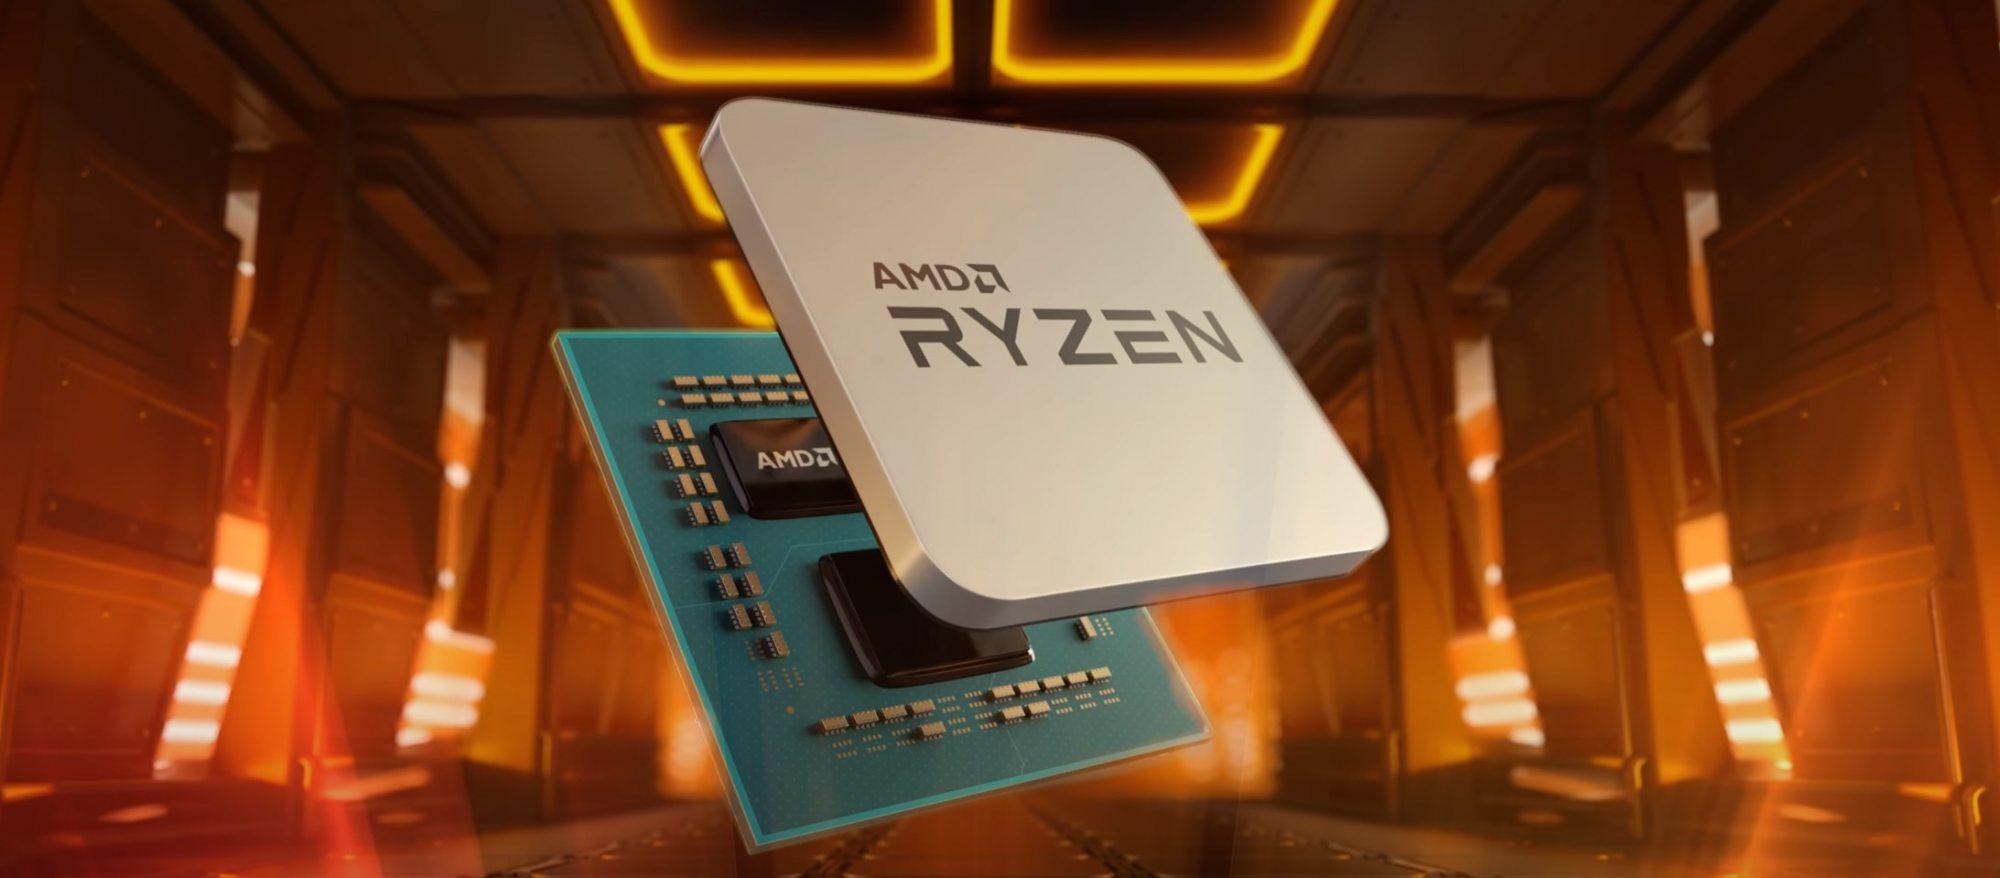 Amd Launches Ryzen 9 3900xt Ryzen 7 3800xt And Ryzen 5 3600xt Processors It World Canada News